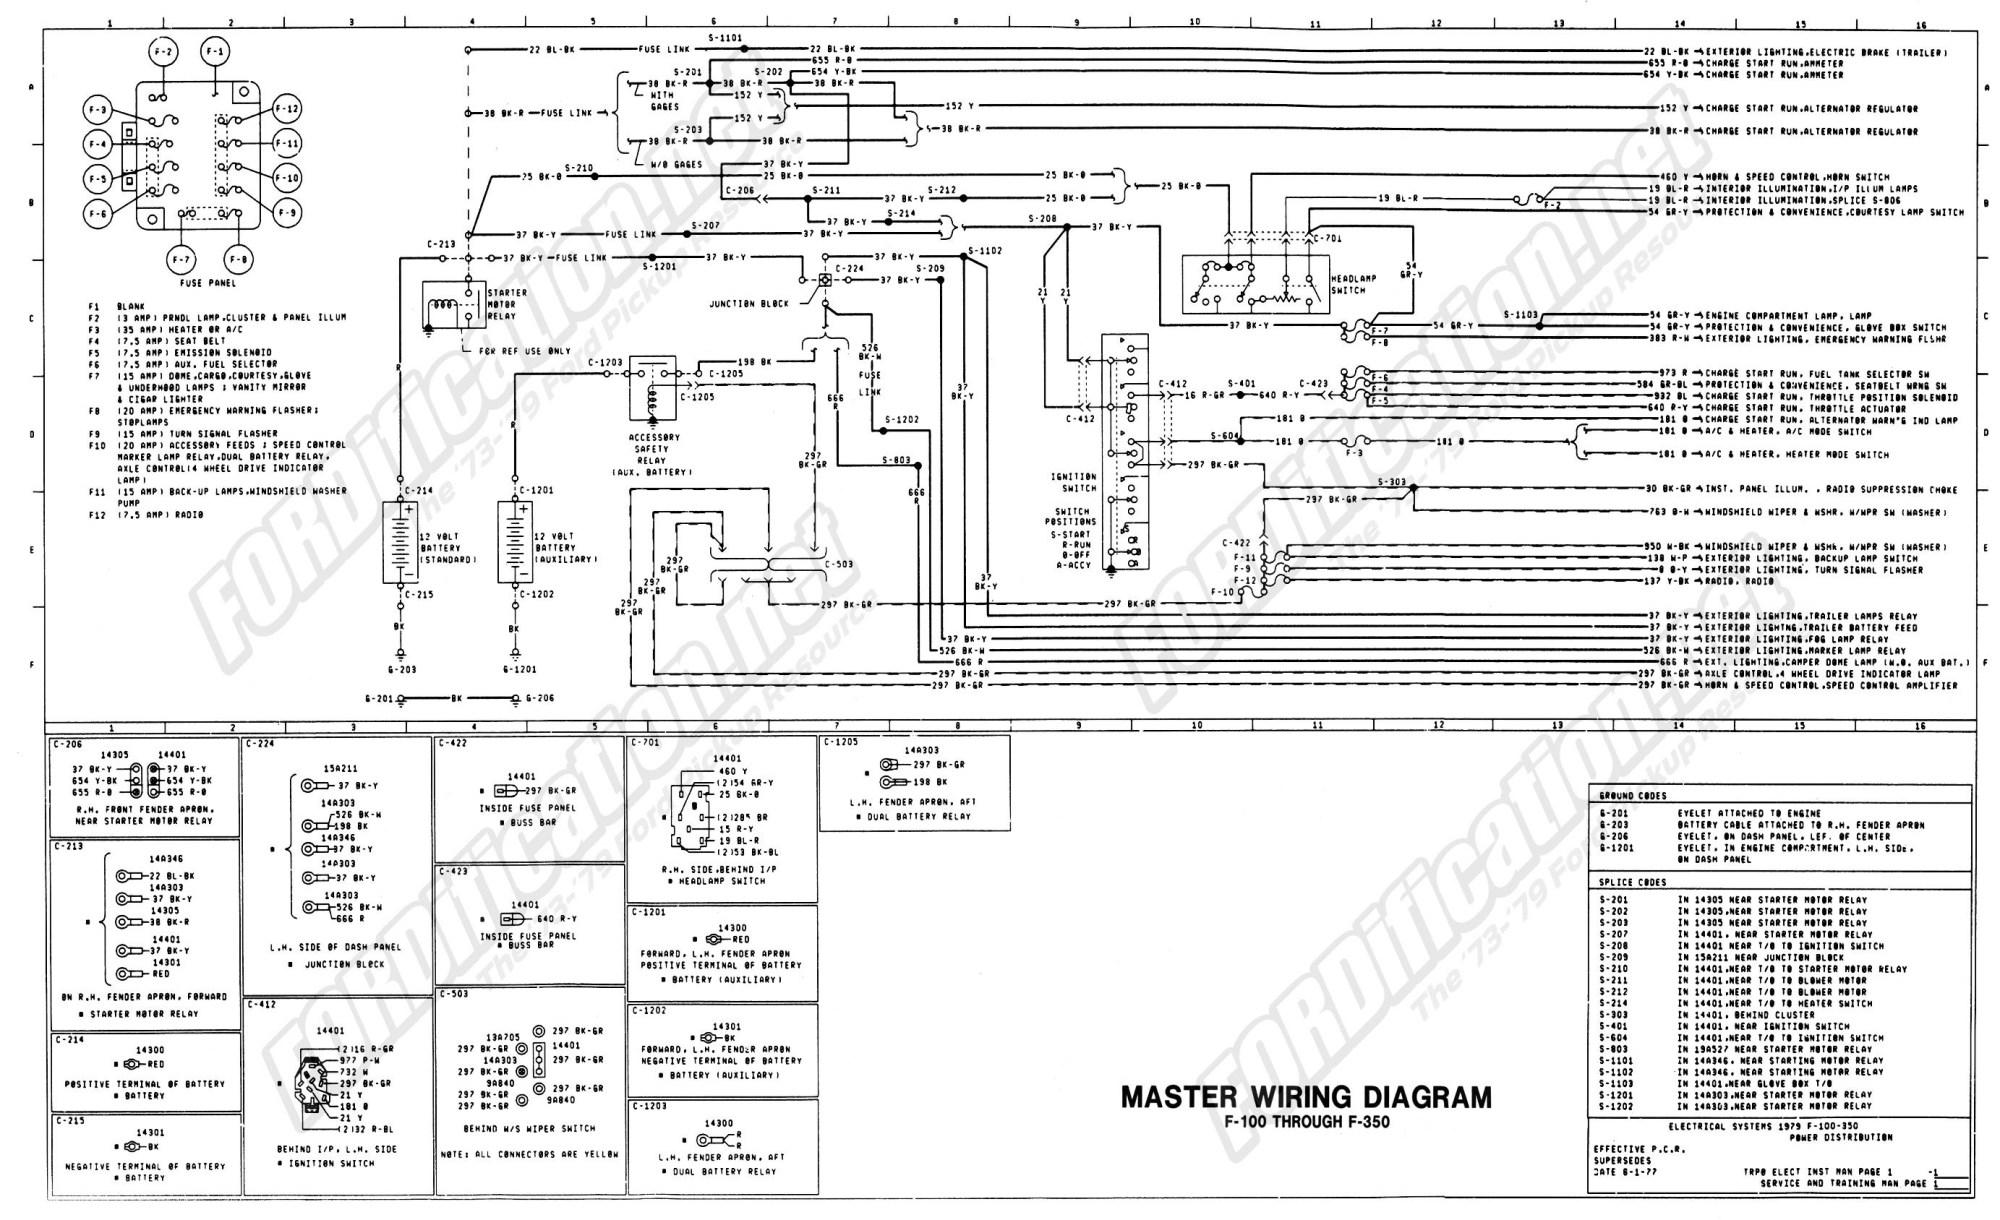 hight resolution of diesel engine starter wiring diagram 79 f150 solenoid wiring diagram ford truck enthusiasts forums of diesel